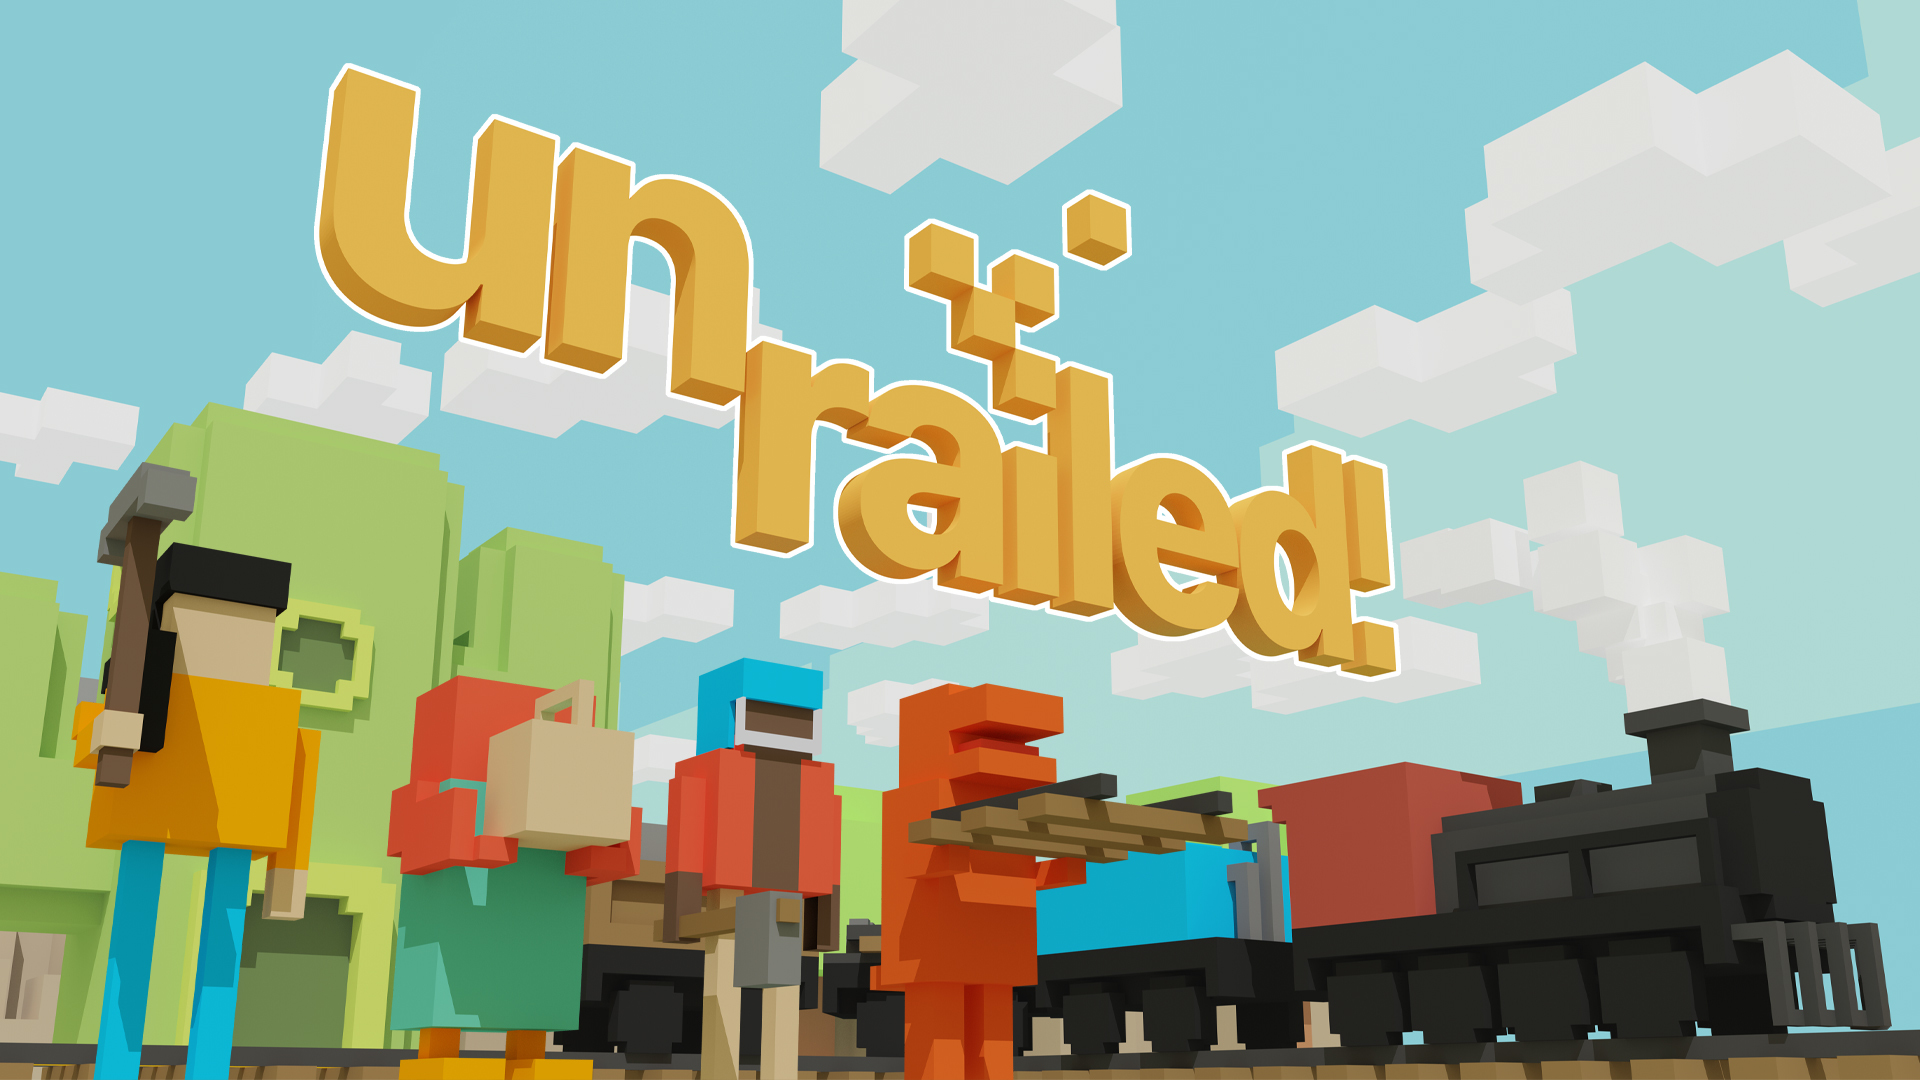 unrailed! trailer